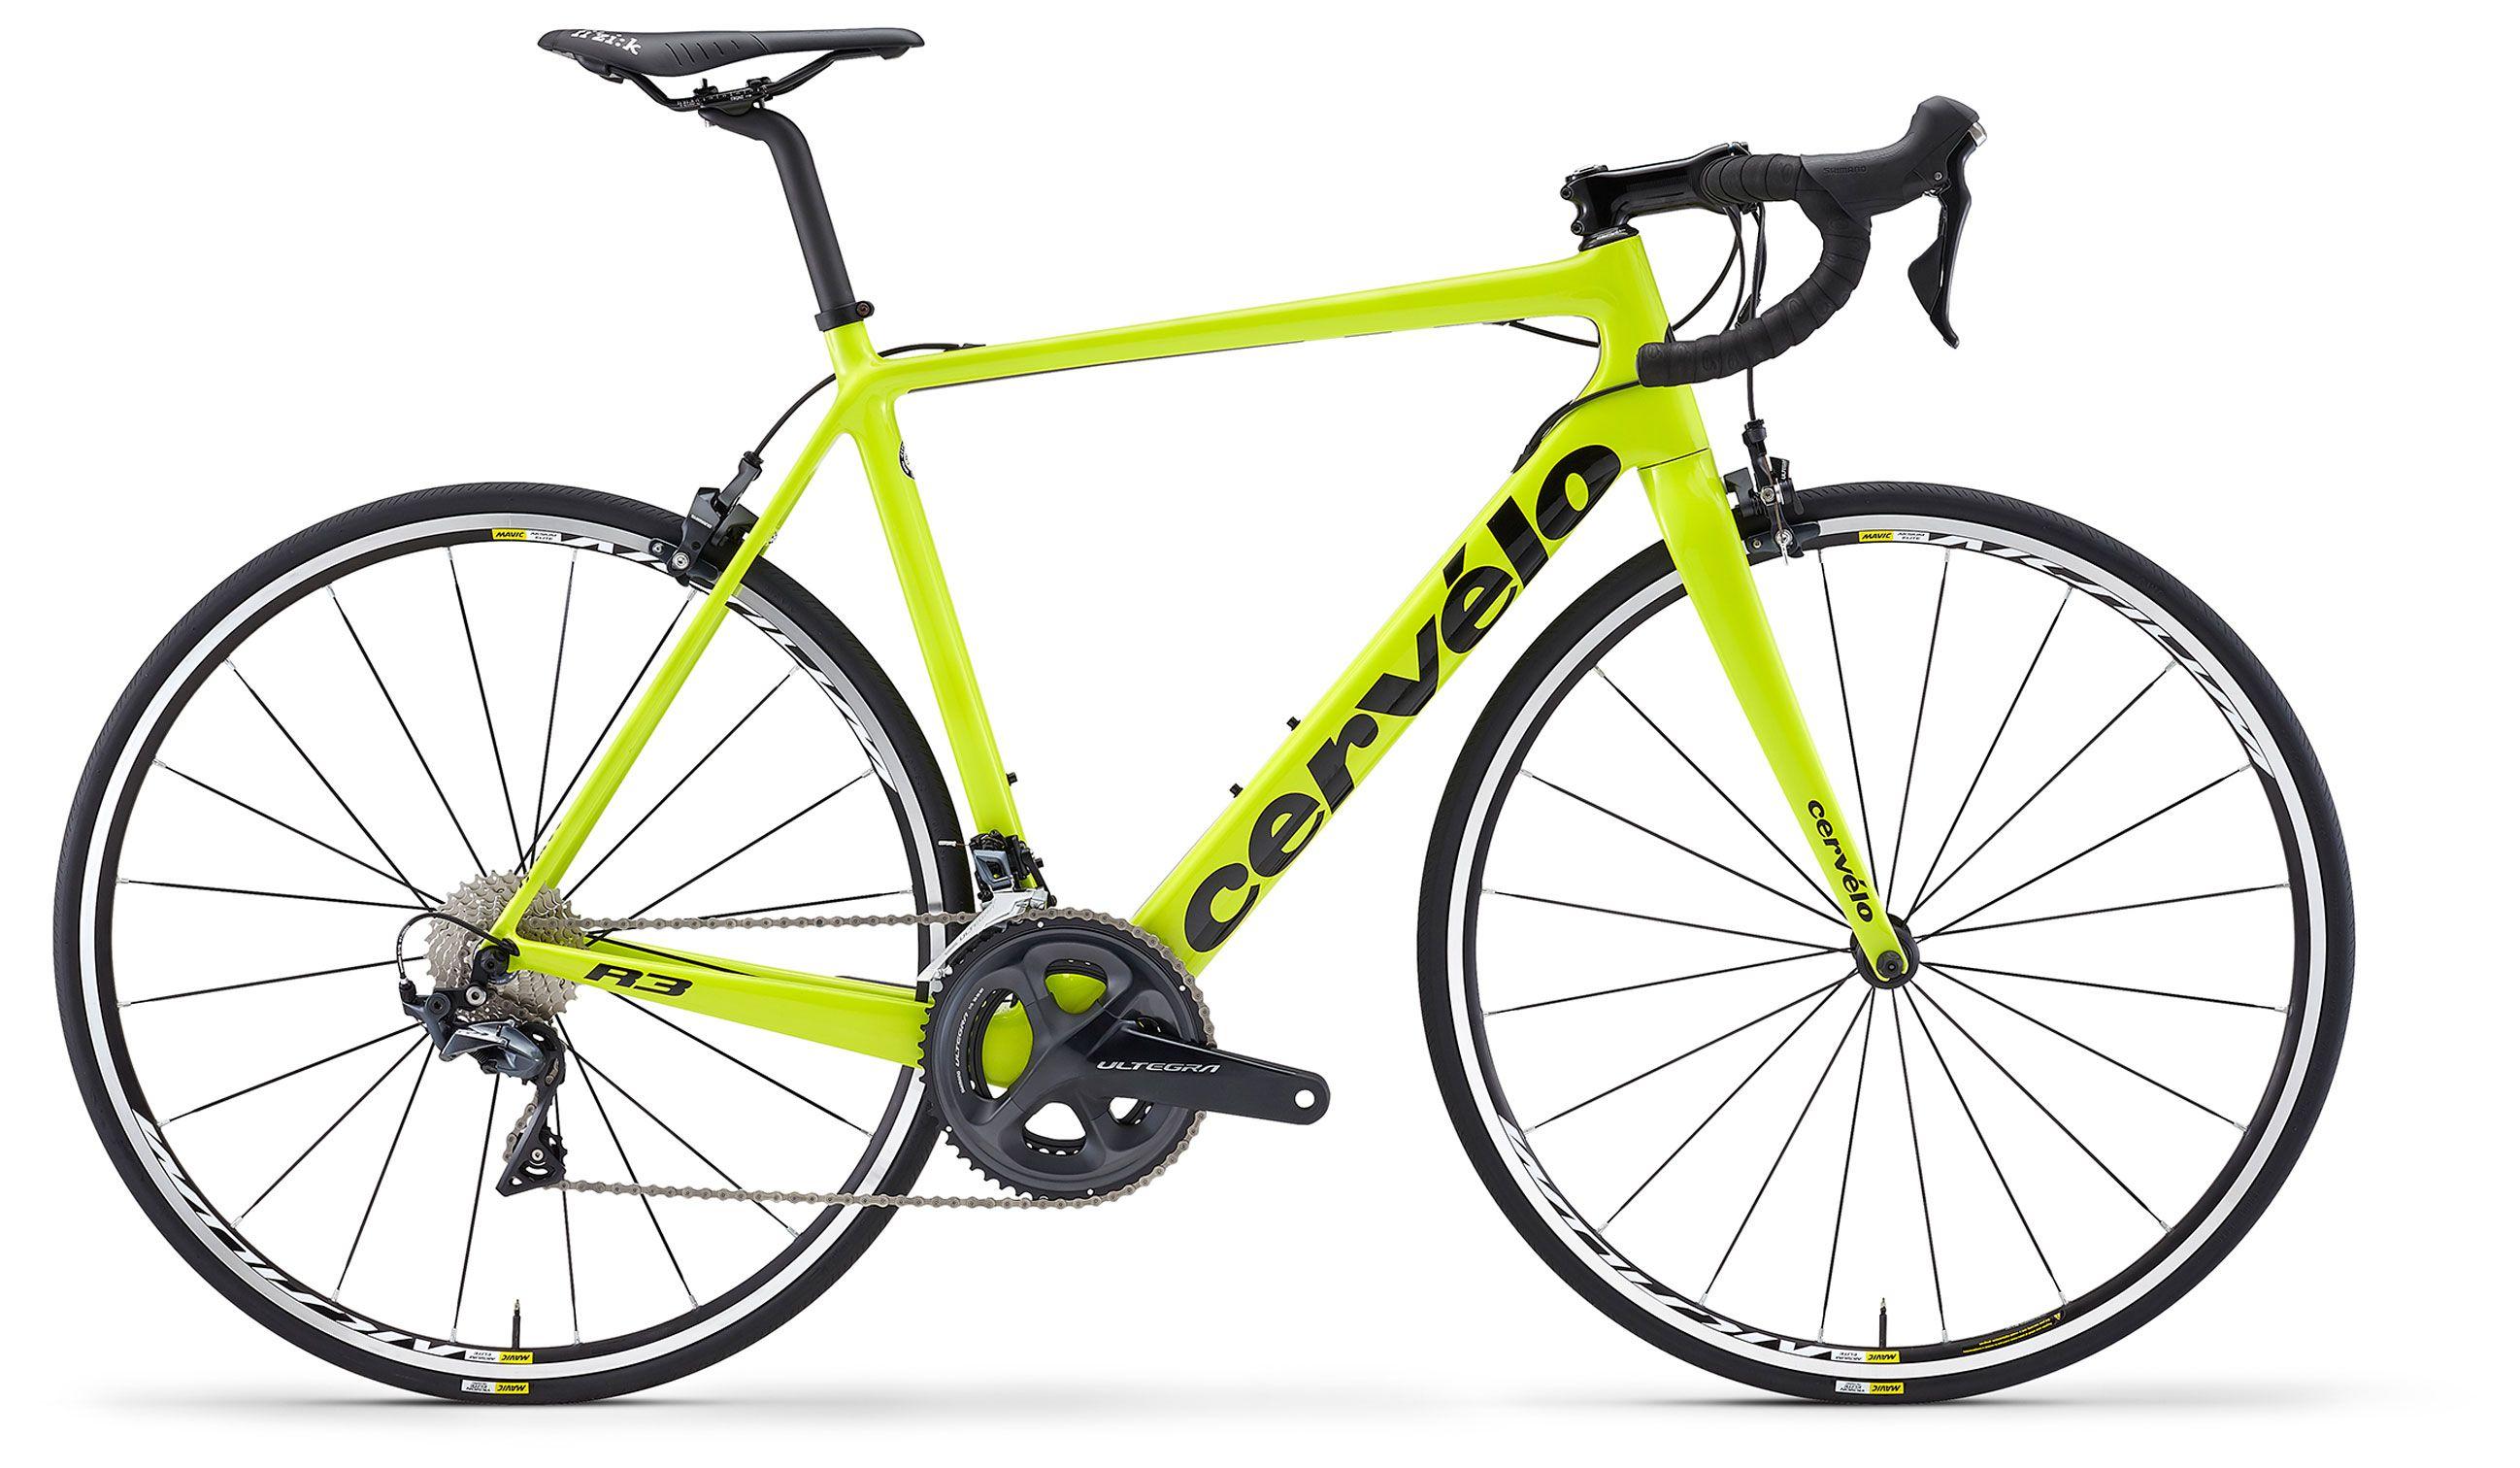 Велосипед Cervelo R3 Ultegra Di2 2018 велосипед cervelo c3 ultegra di2 2018